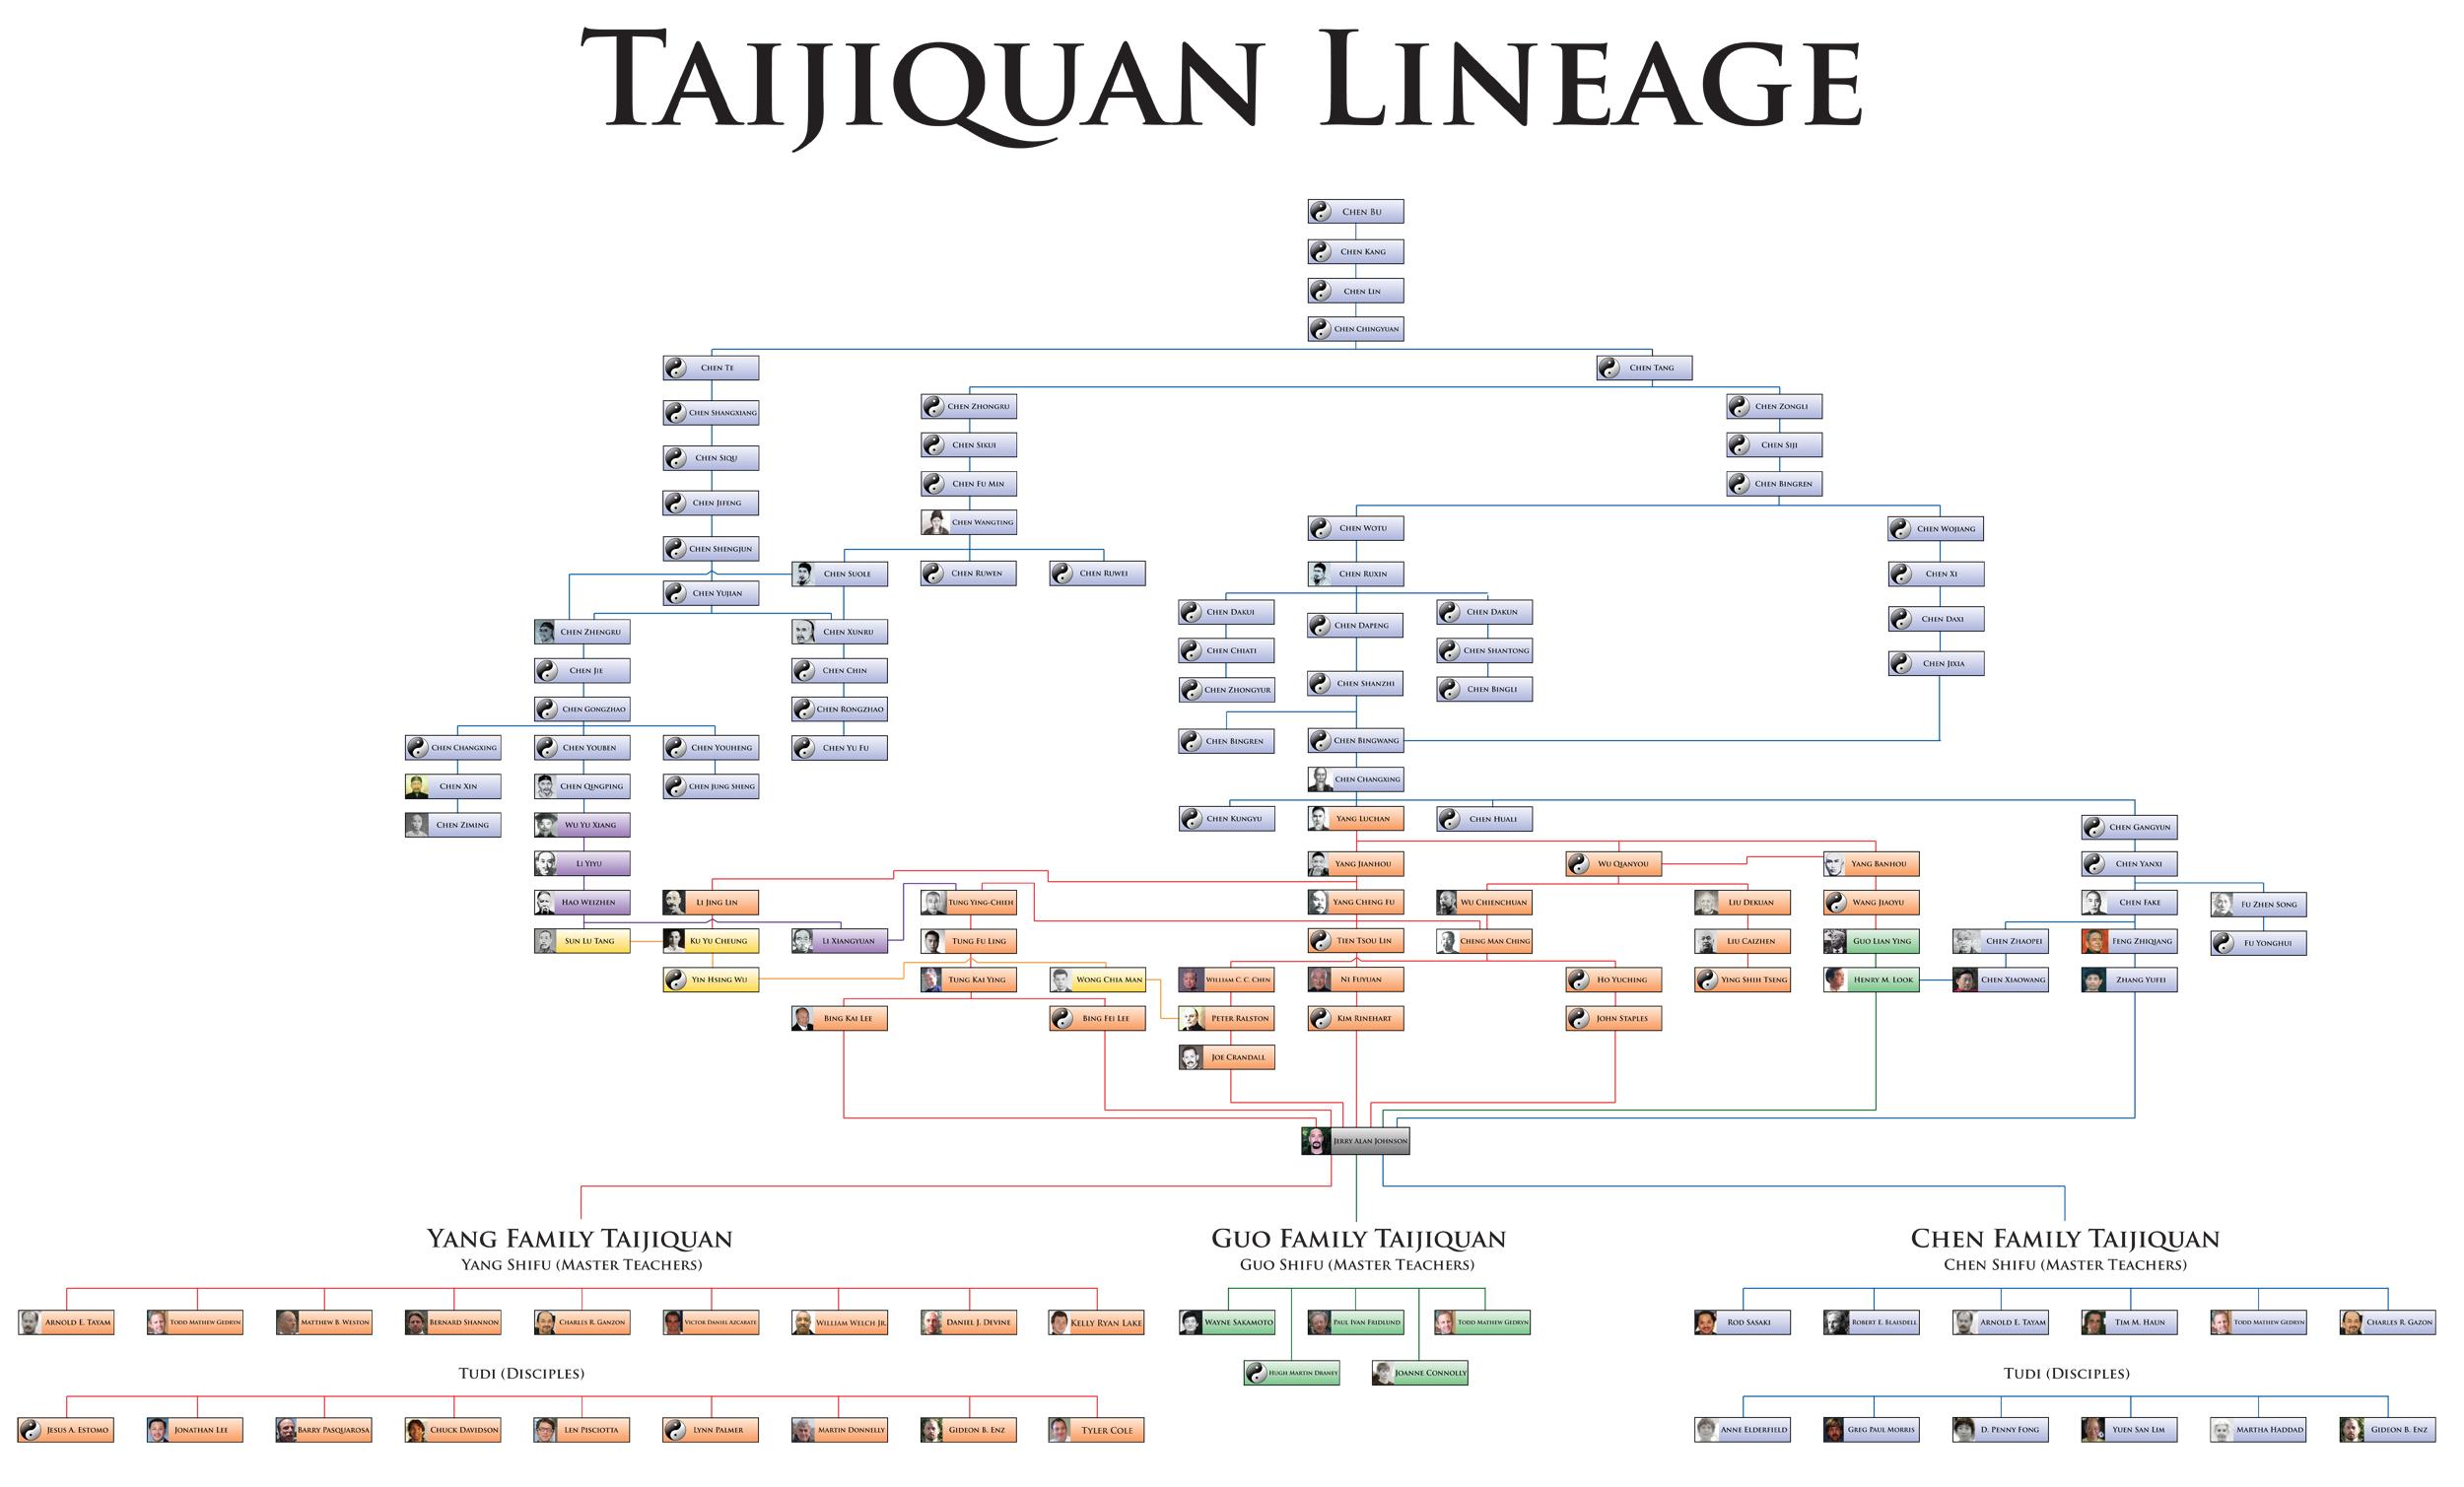 Taijiquan-Lineage-Professor-Jerry-Alan-Johnson.jpg